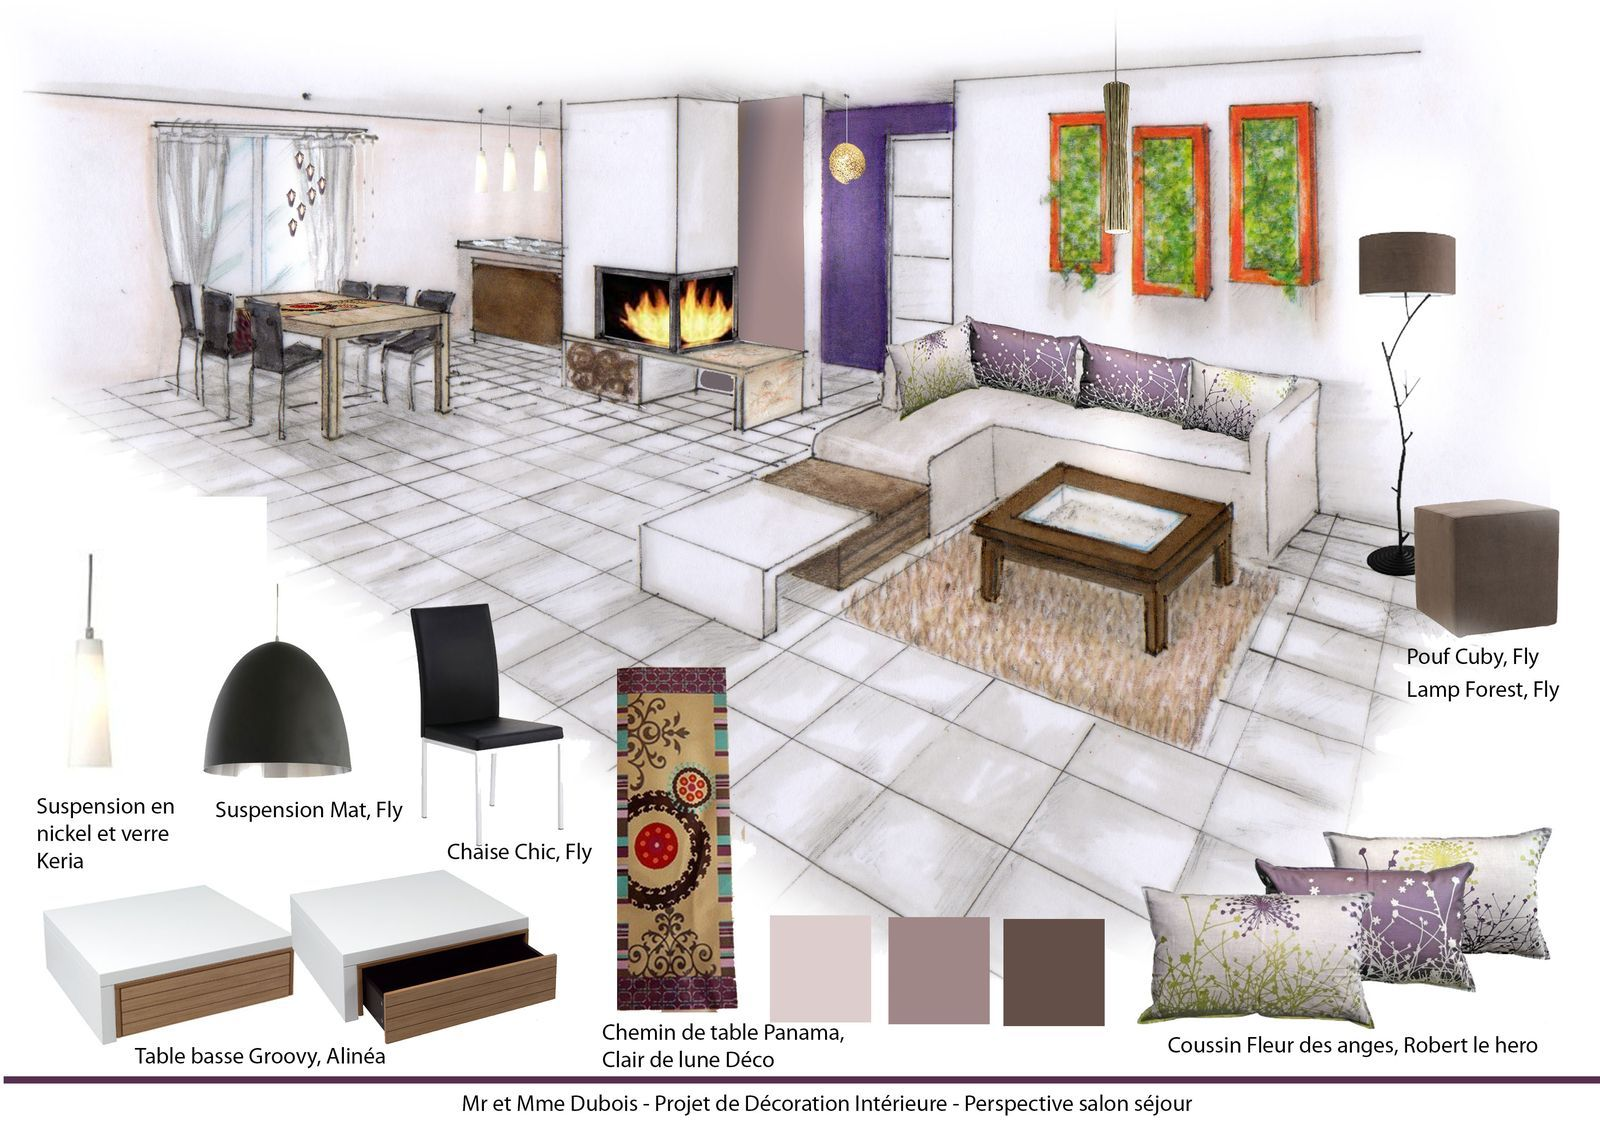 keria annecy beautiful jetpack joyride gravity guy zombieville usa league of evil gunslugs. Black Bedroom Furniture Sets. Home Design Ideas